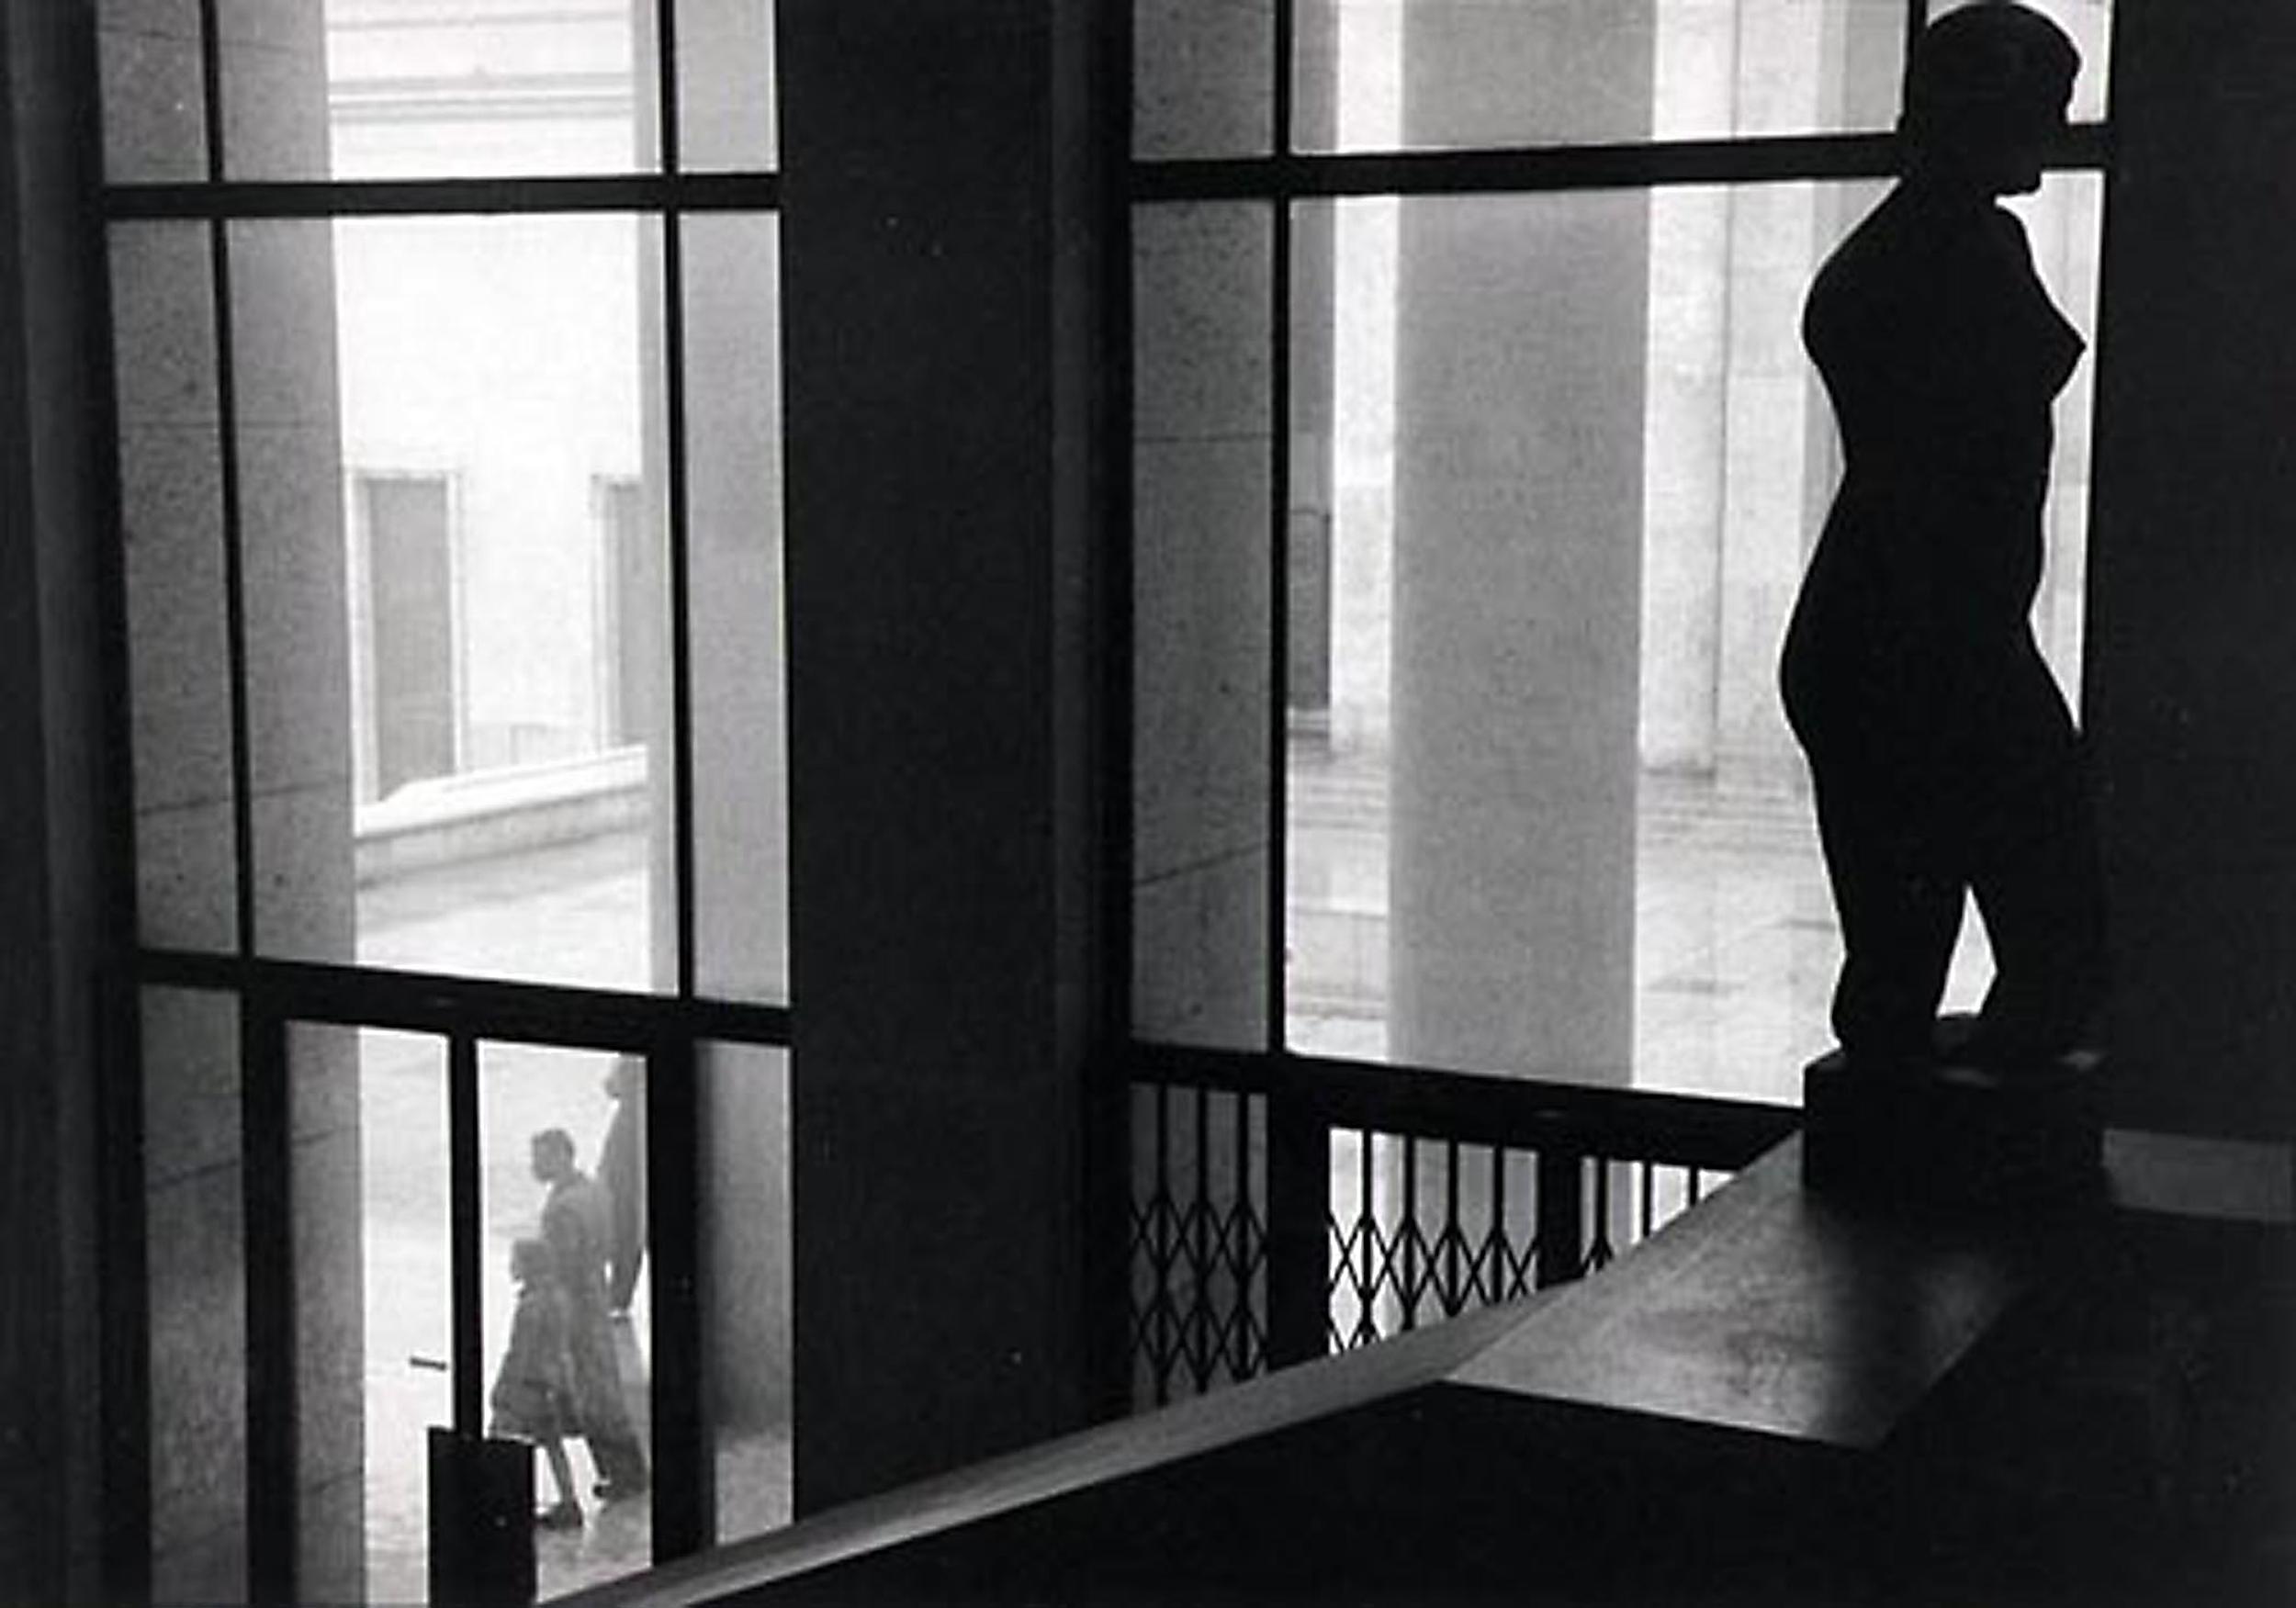 HANNON_courtyard_of_louvre_(paris)_1956_p11x14_high.jpg